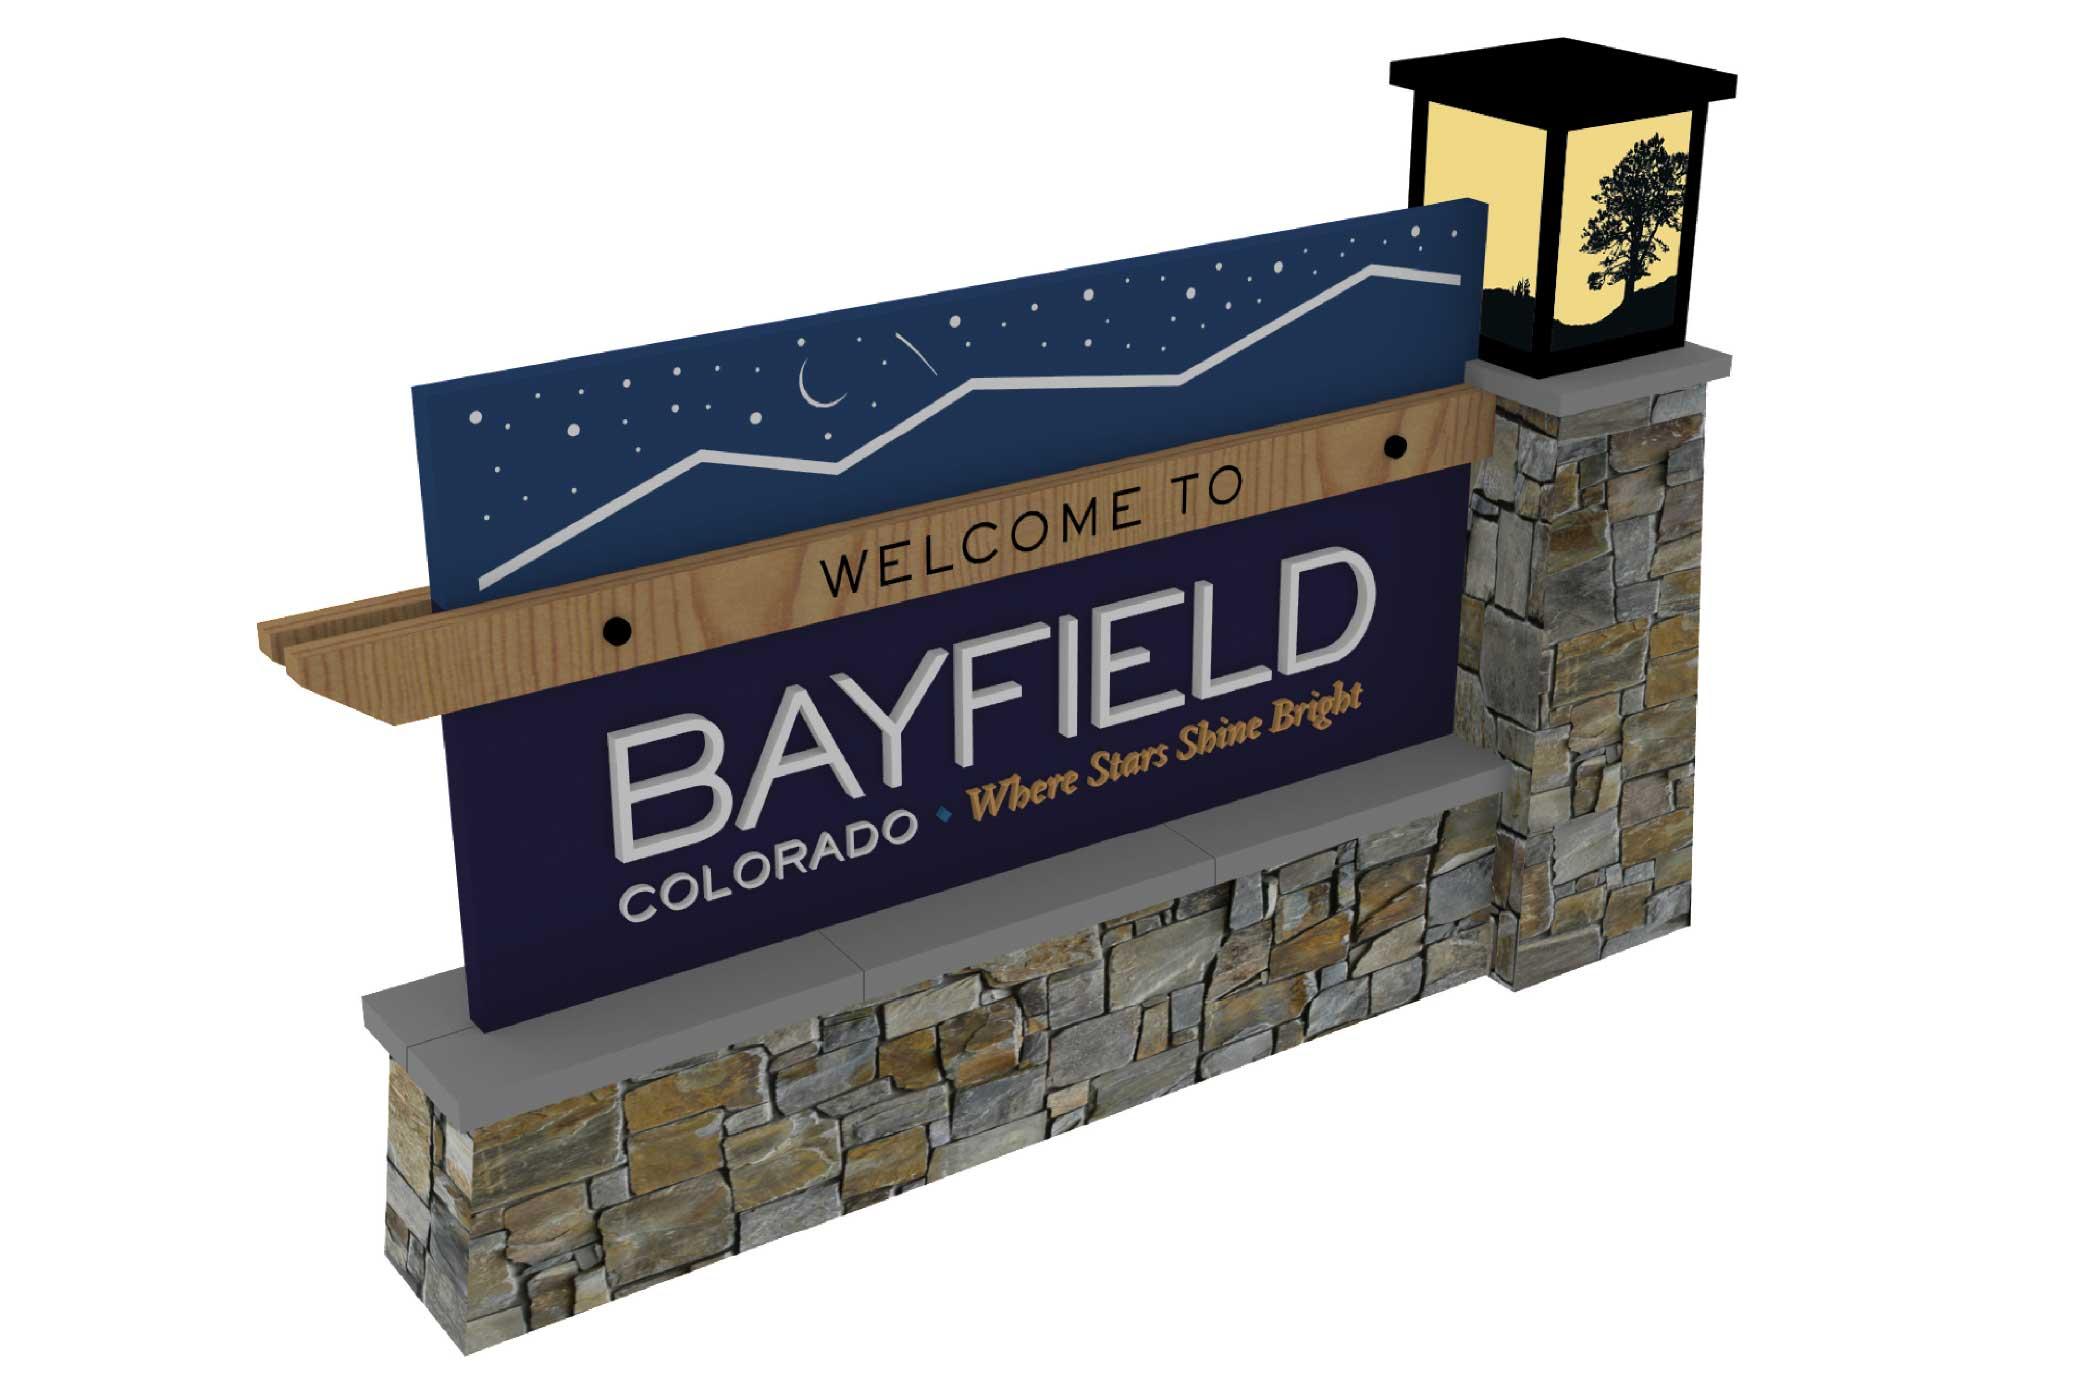 Bayfield_Monument_02.jpg